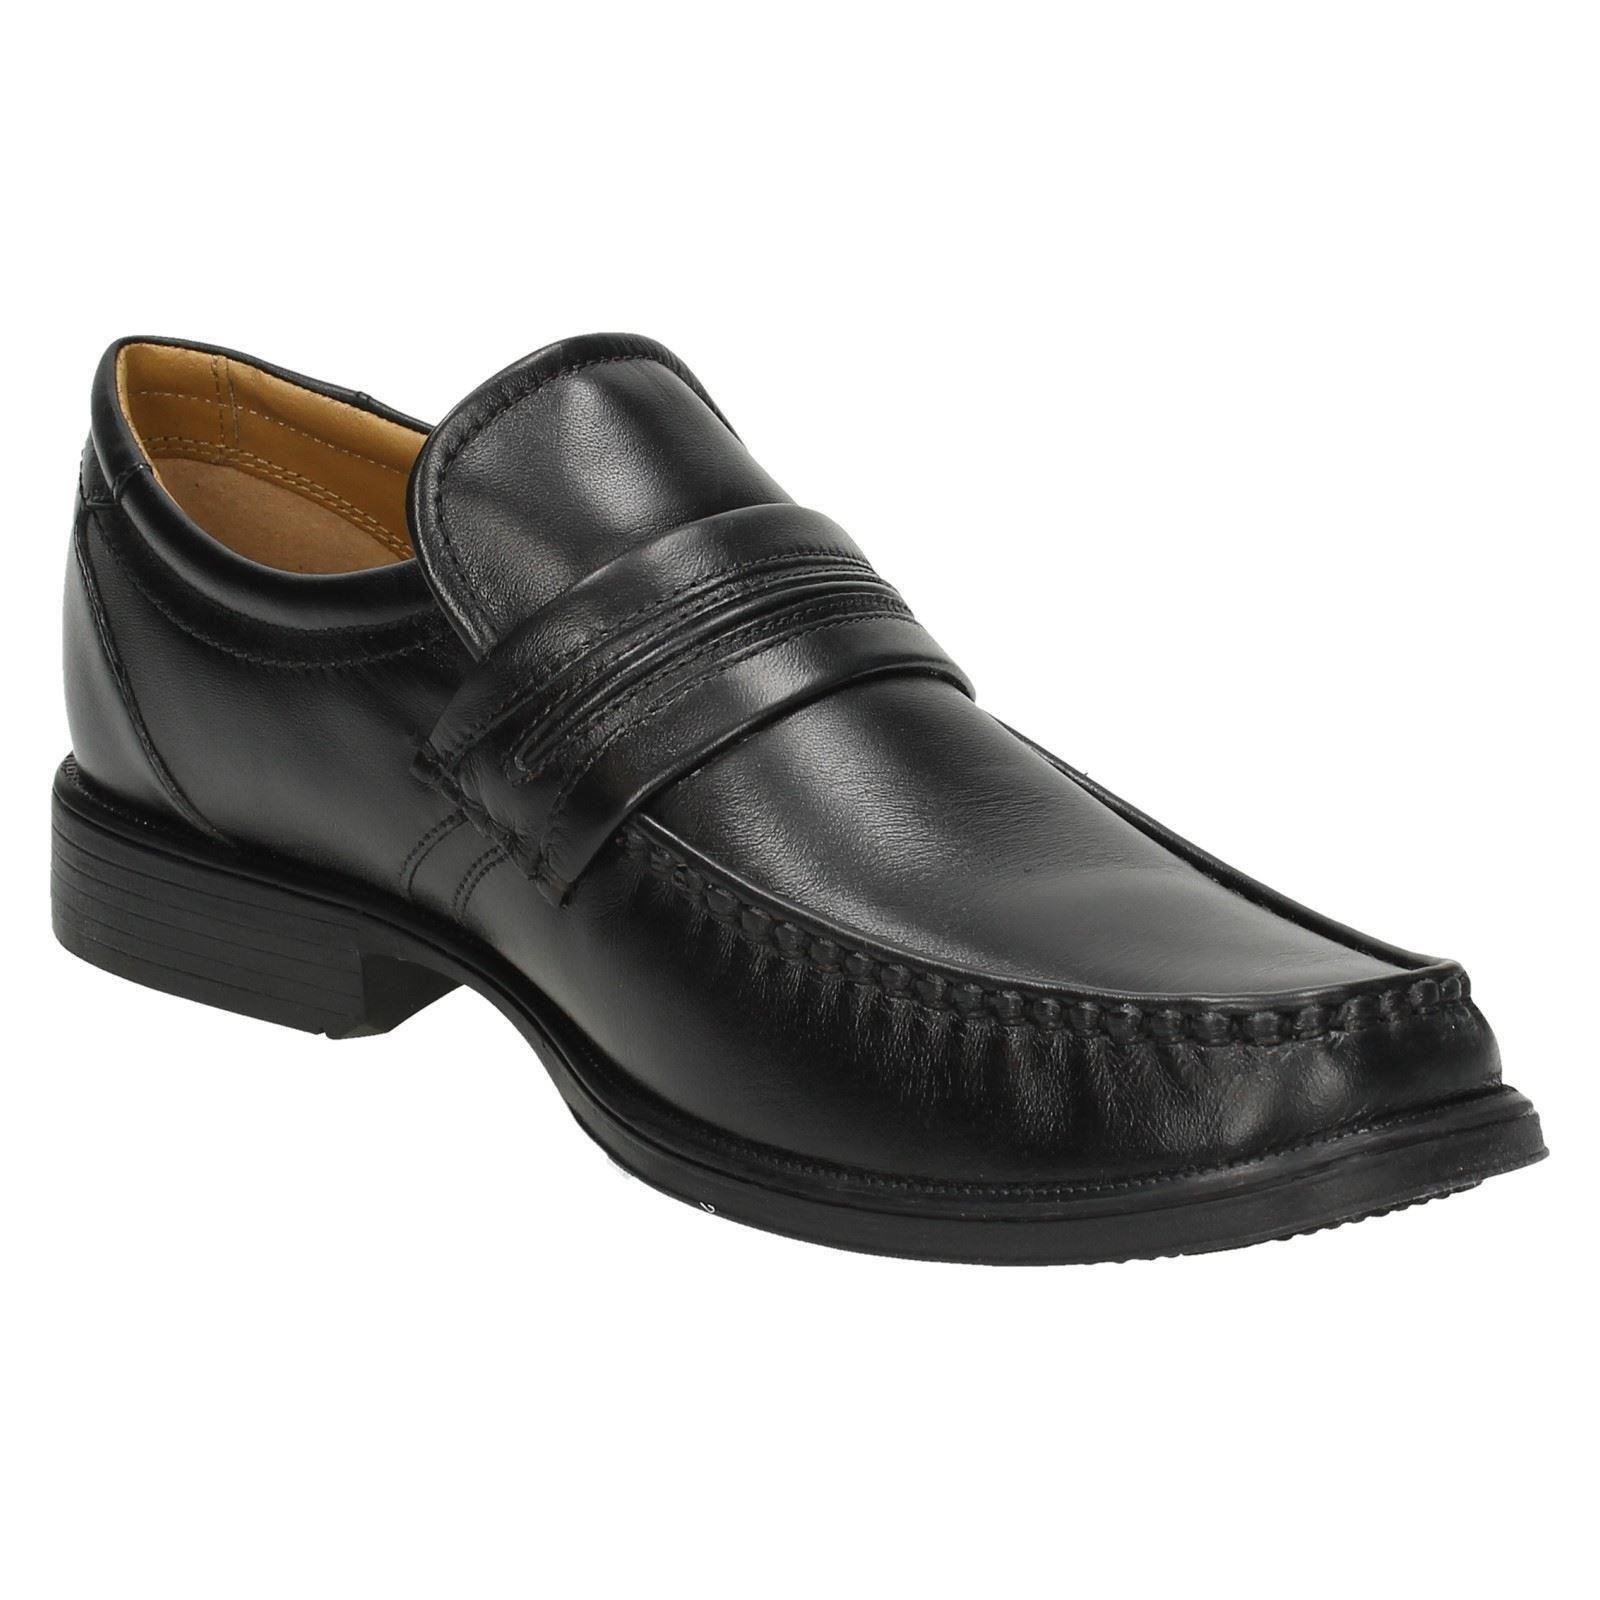 Uomo Clarks Slip Work On Shoes Style Handle Work Slip ~ N 9130d5